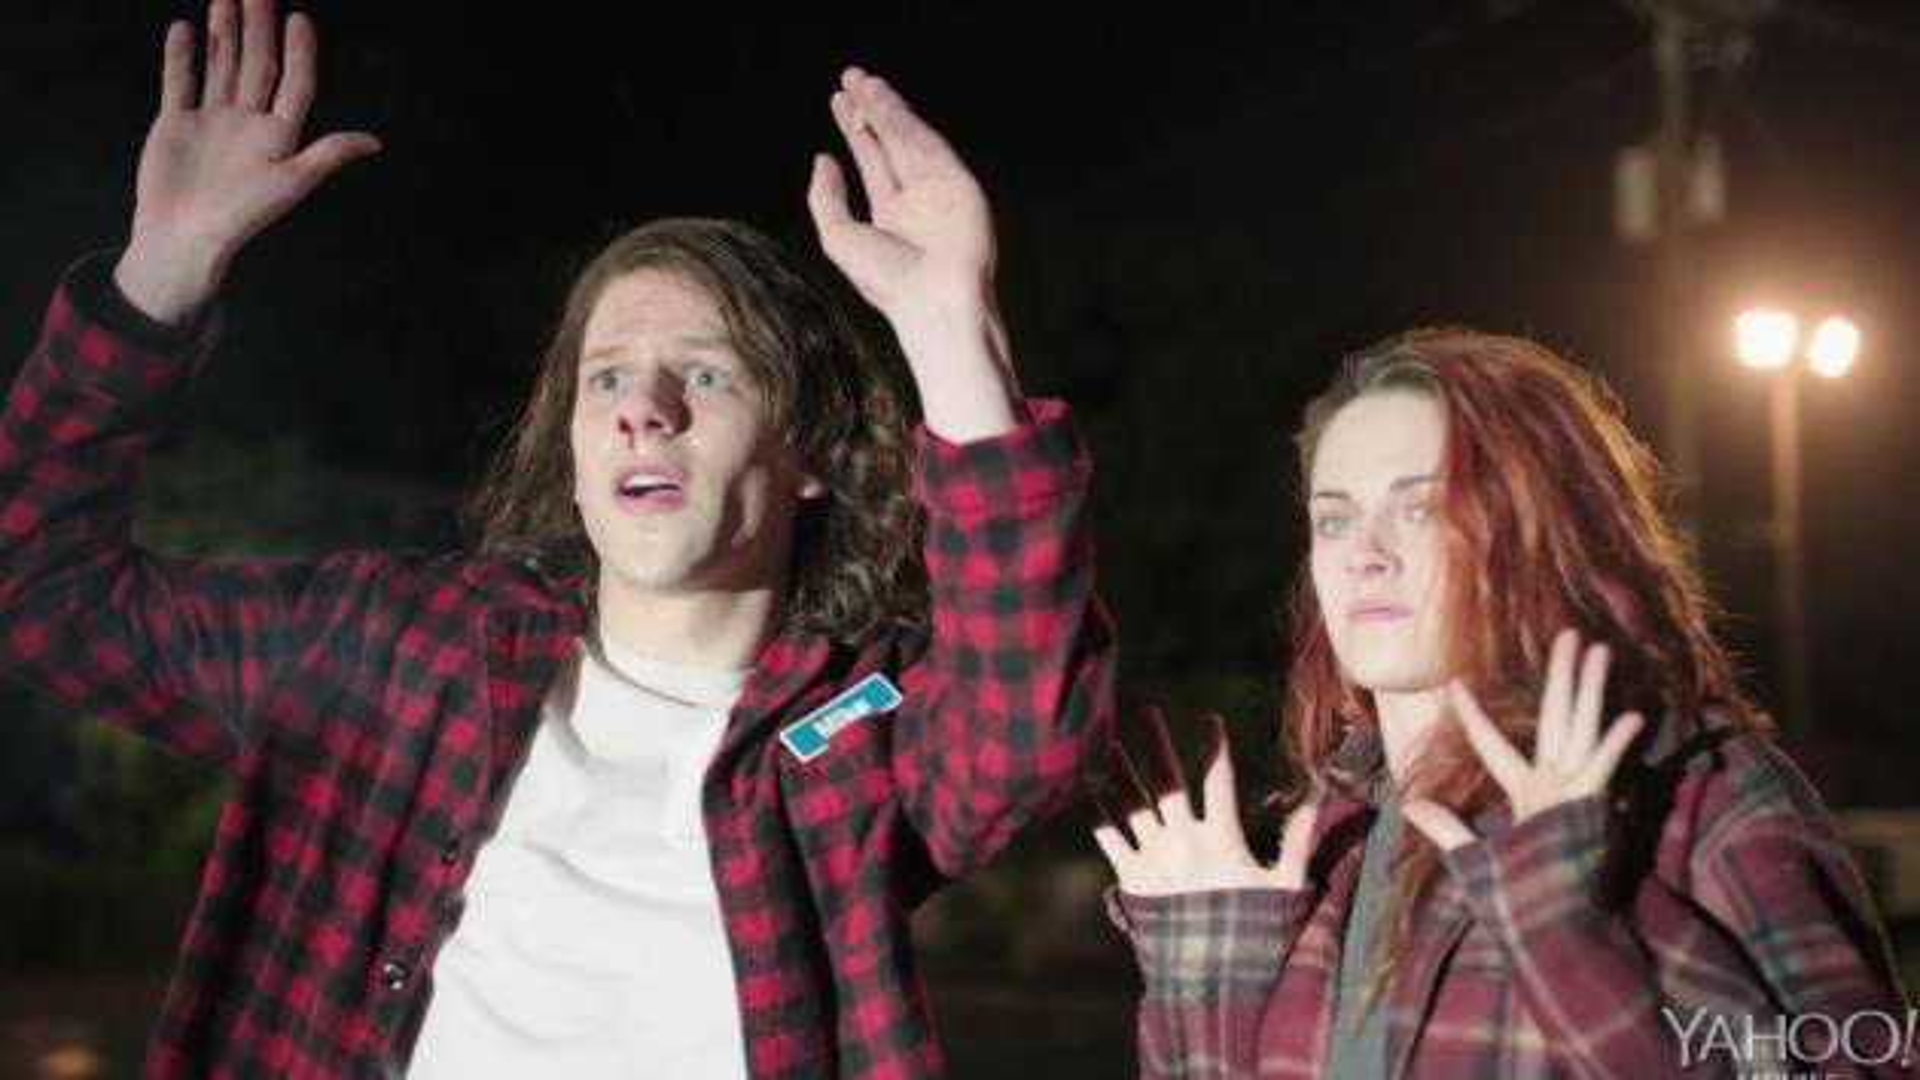 Jesse-Eisenberg-Kristen-Stewart-American-Ultra-Trailer